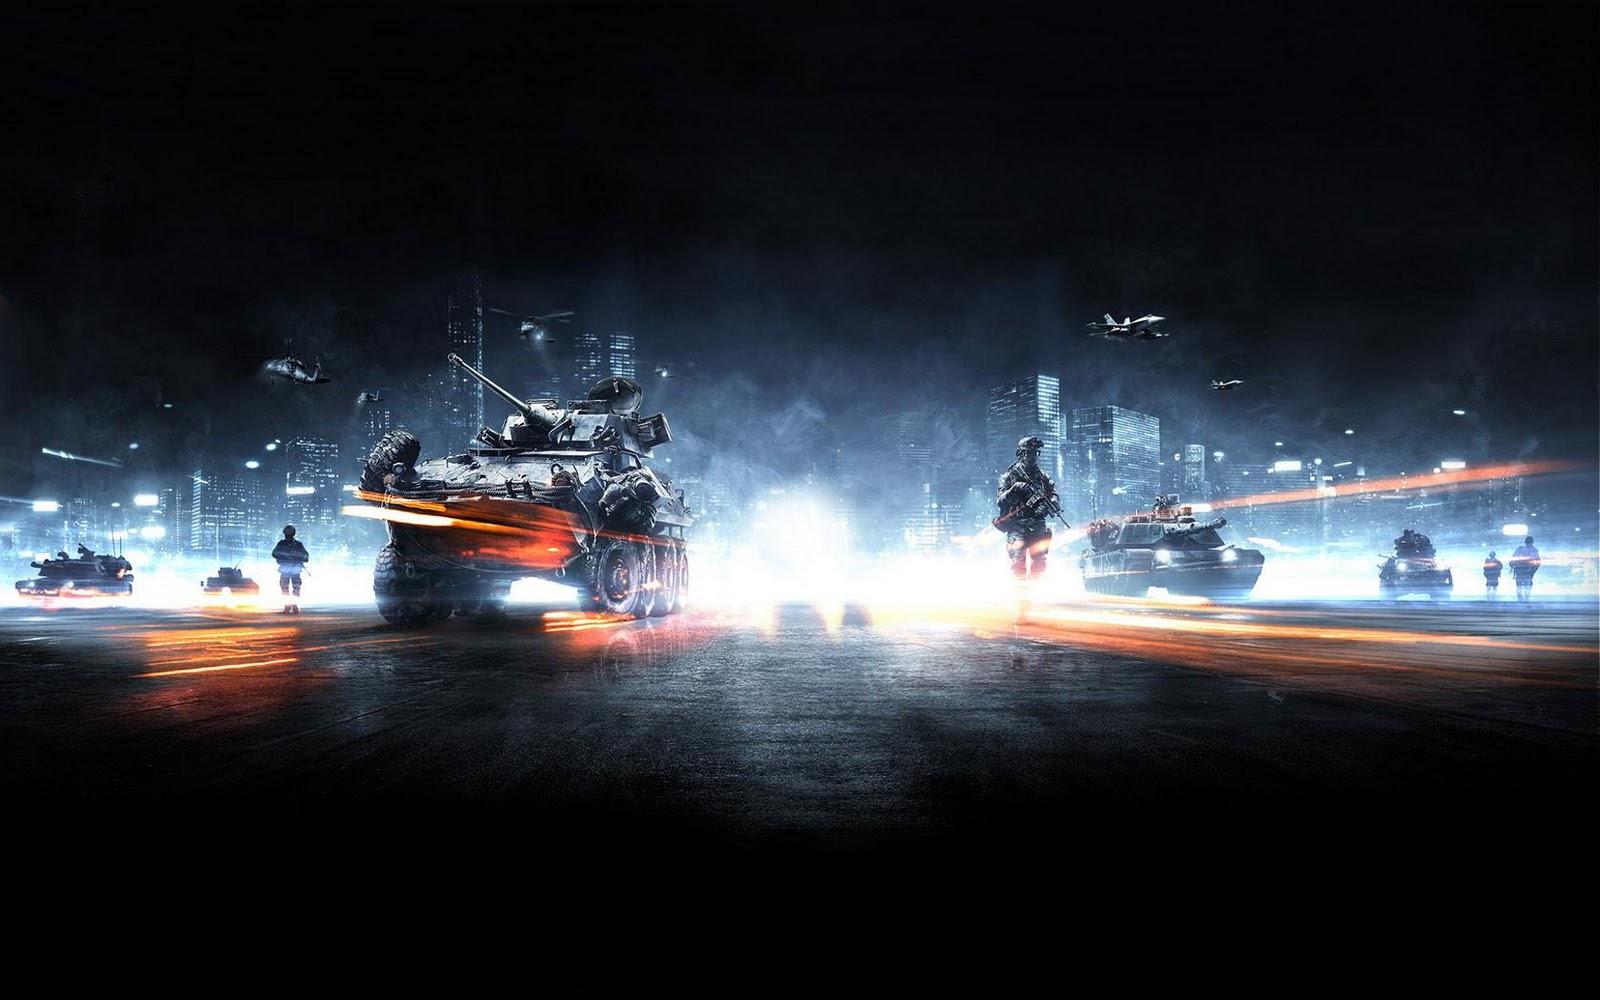 http://3.bp.blogspot.com/-phQBftsSzas/TsL_s8f0h5I/AAAAAAAADpA/duISAeUGWIo/s1600/Battlefield+3+Wallpaper+HD.jpg